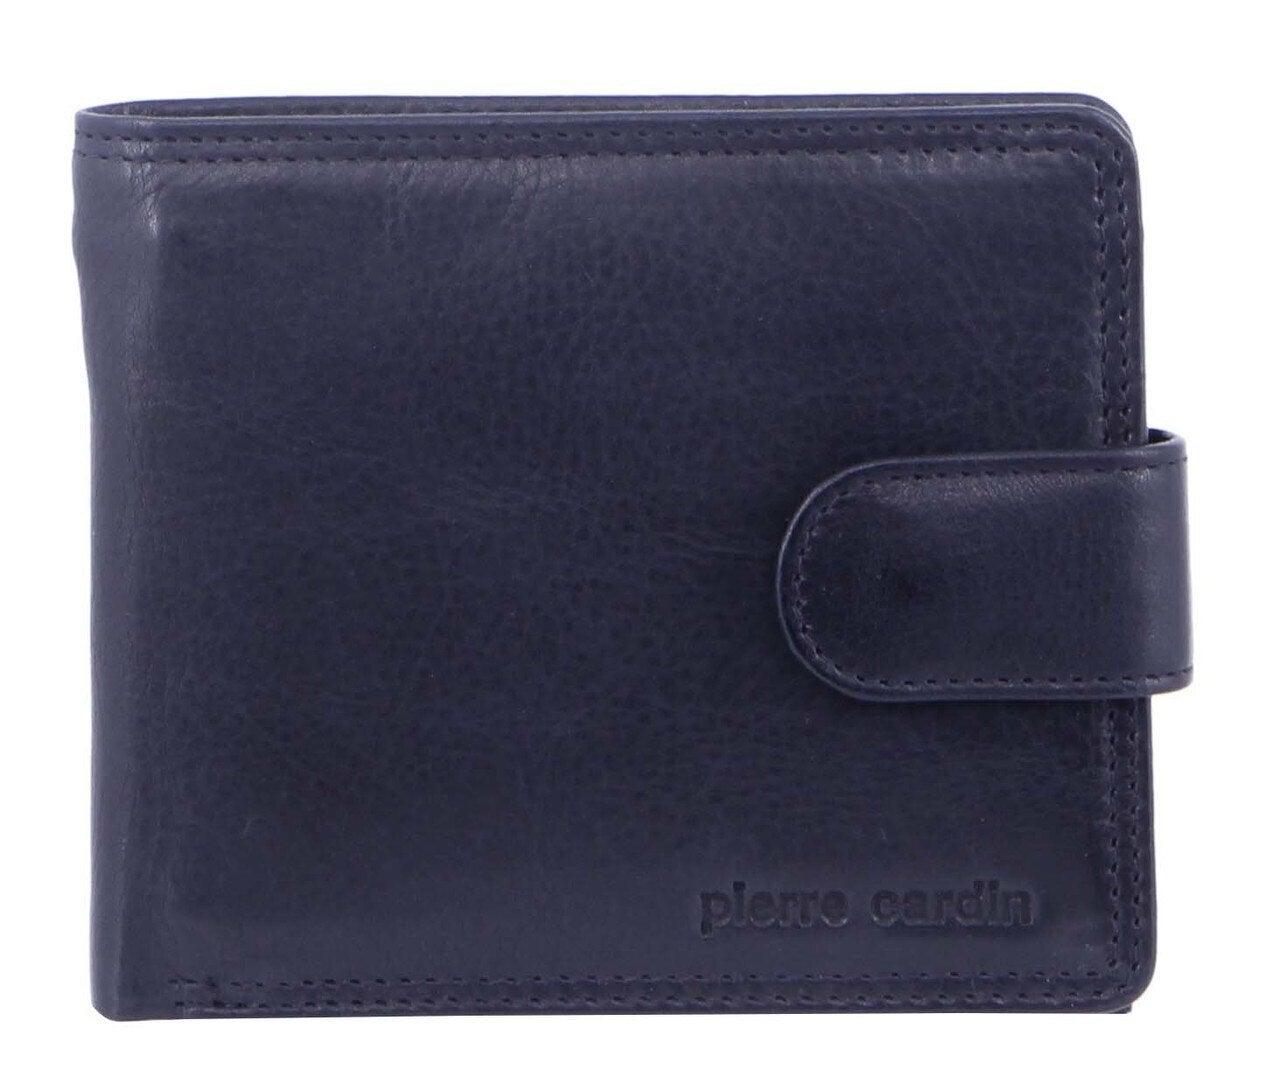 Pierre Cardin Mens RFID Slim Wallet Genuine Italian Leather Gift Box - Midnight